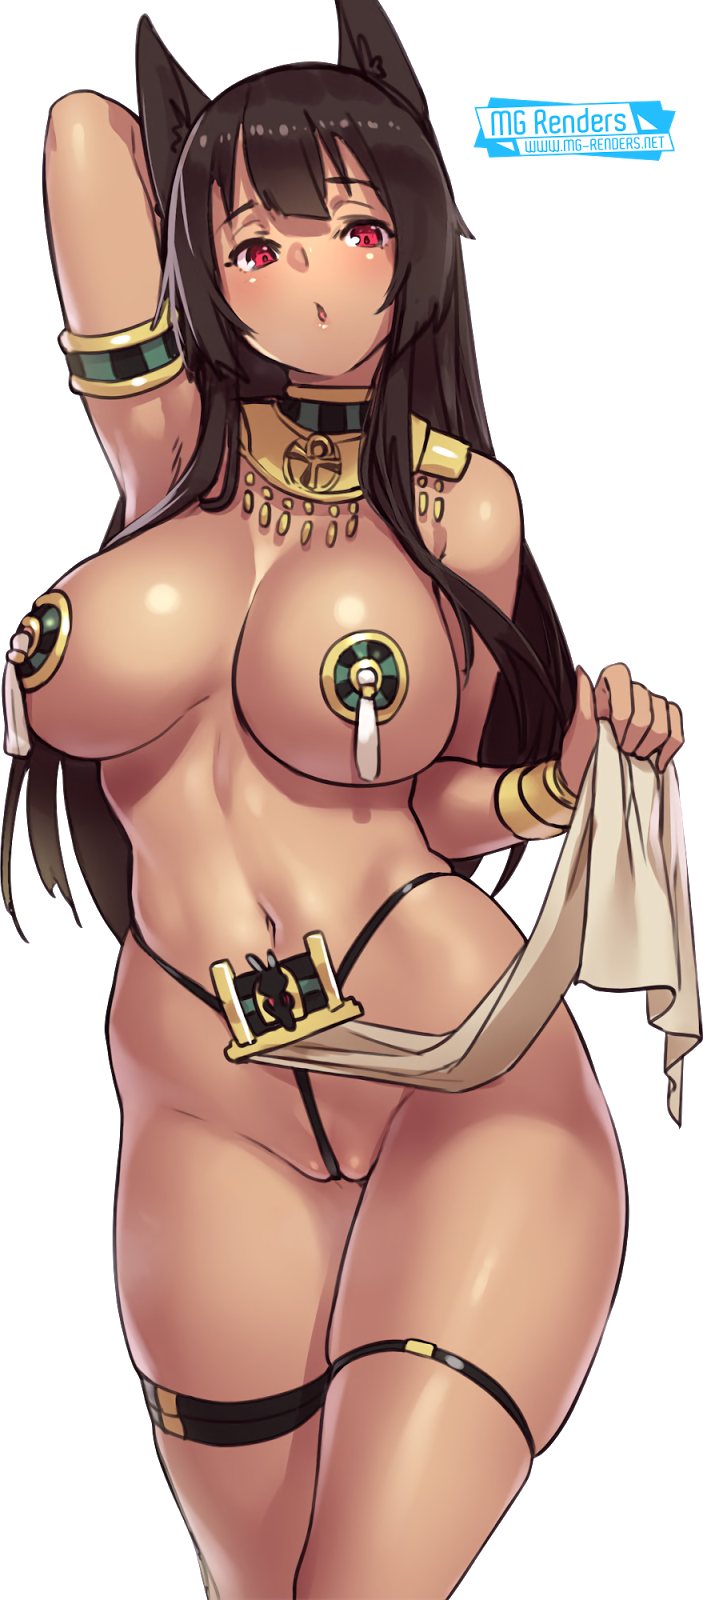 Tags: Anime, Render,  Armpit,  Dark skin,  Houtengeki,  Micro Bikini,  Original Character, PNG, Image, Picture